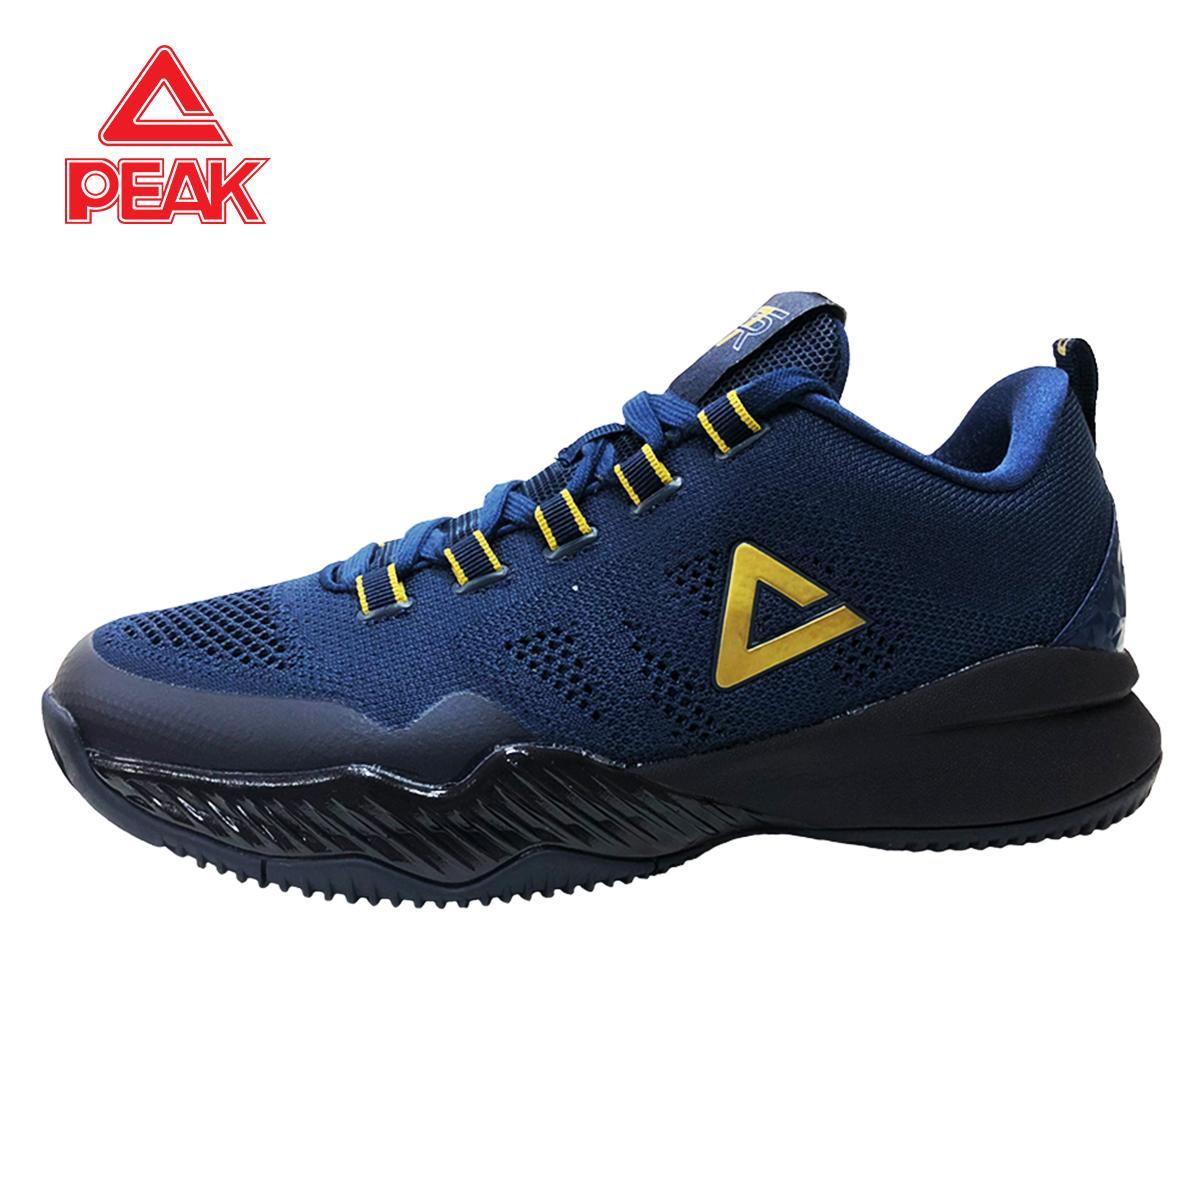 8afbdf9b37f Peak Philippines  Peak price list - Peak Slippers   Sneakers for Men ...